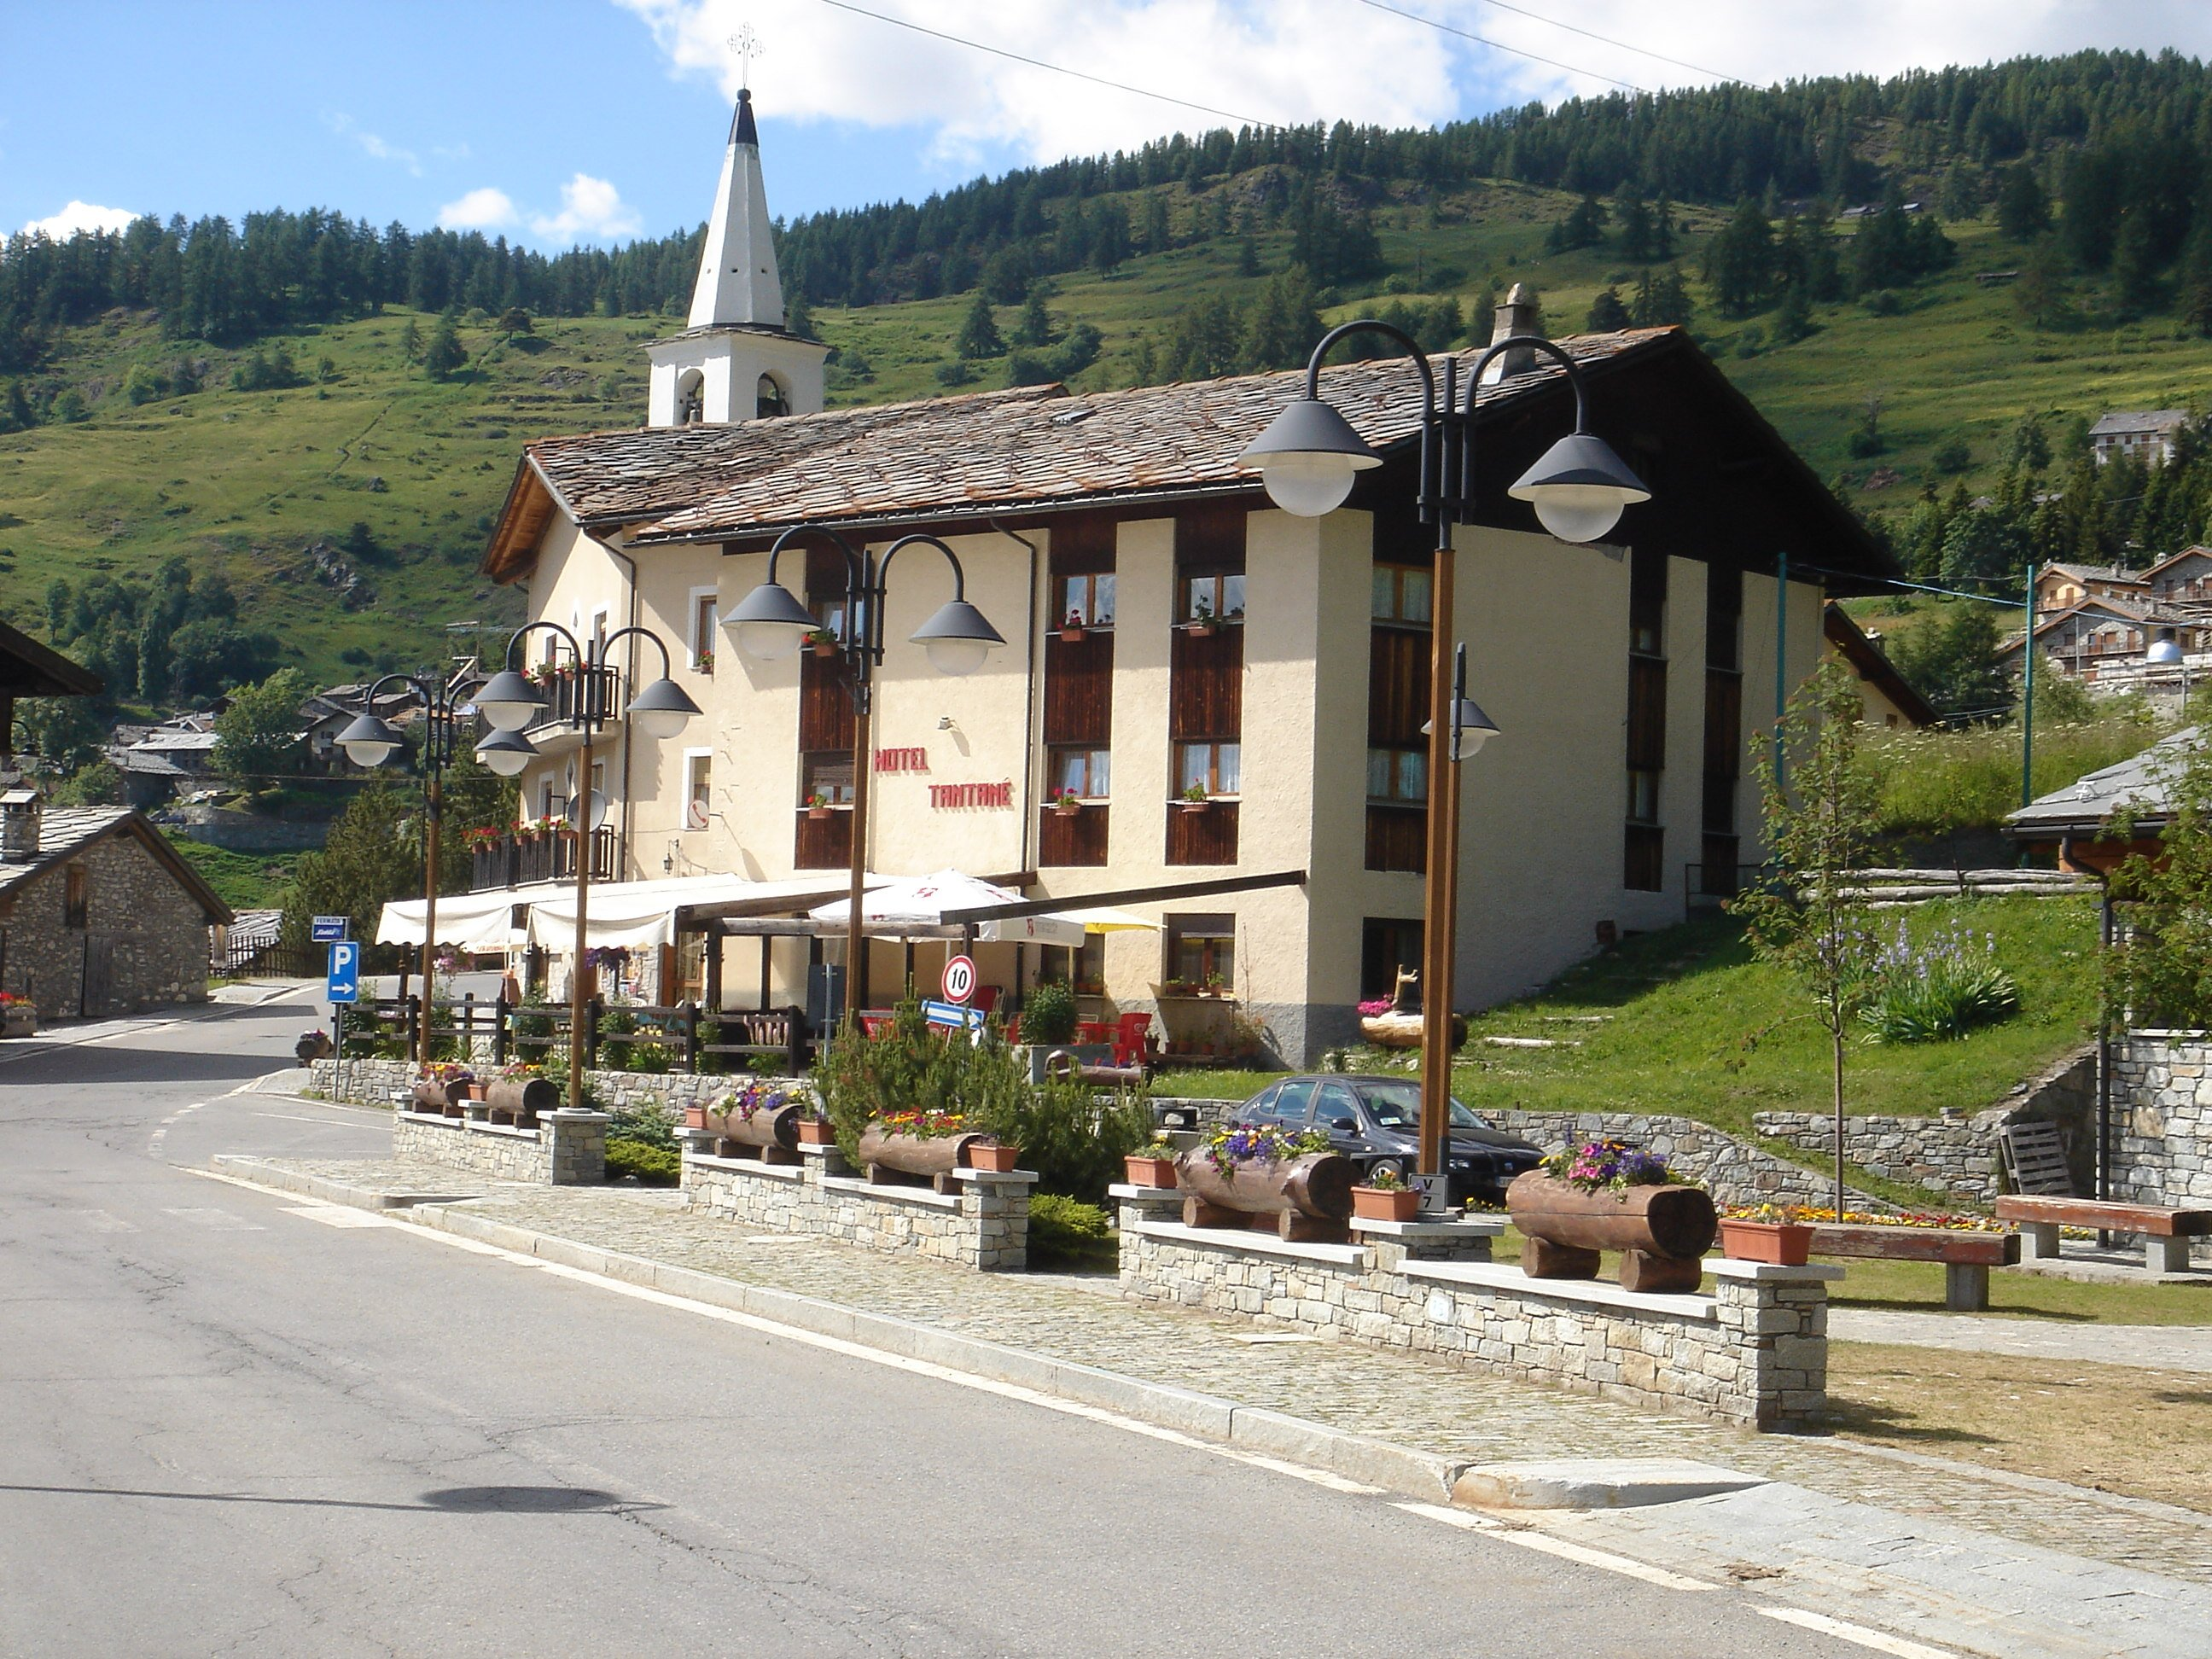 Hotel Tantane'